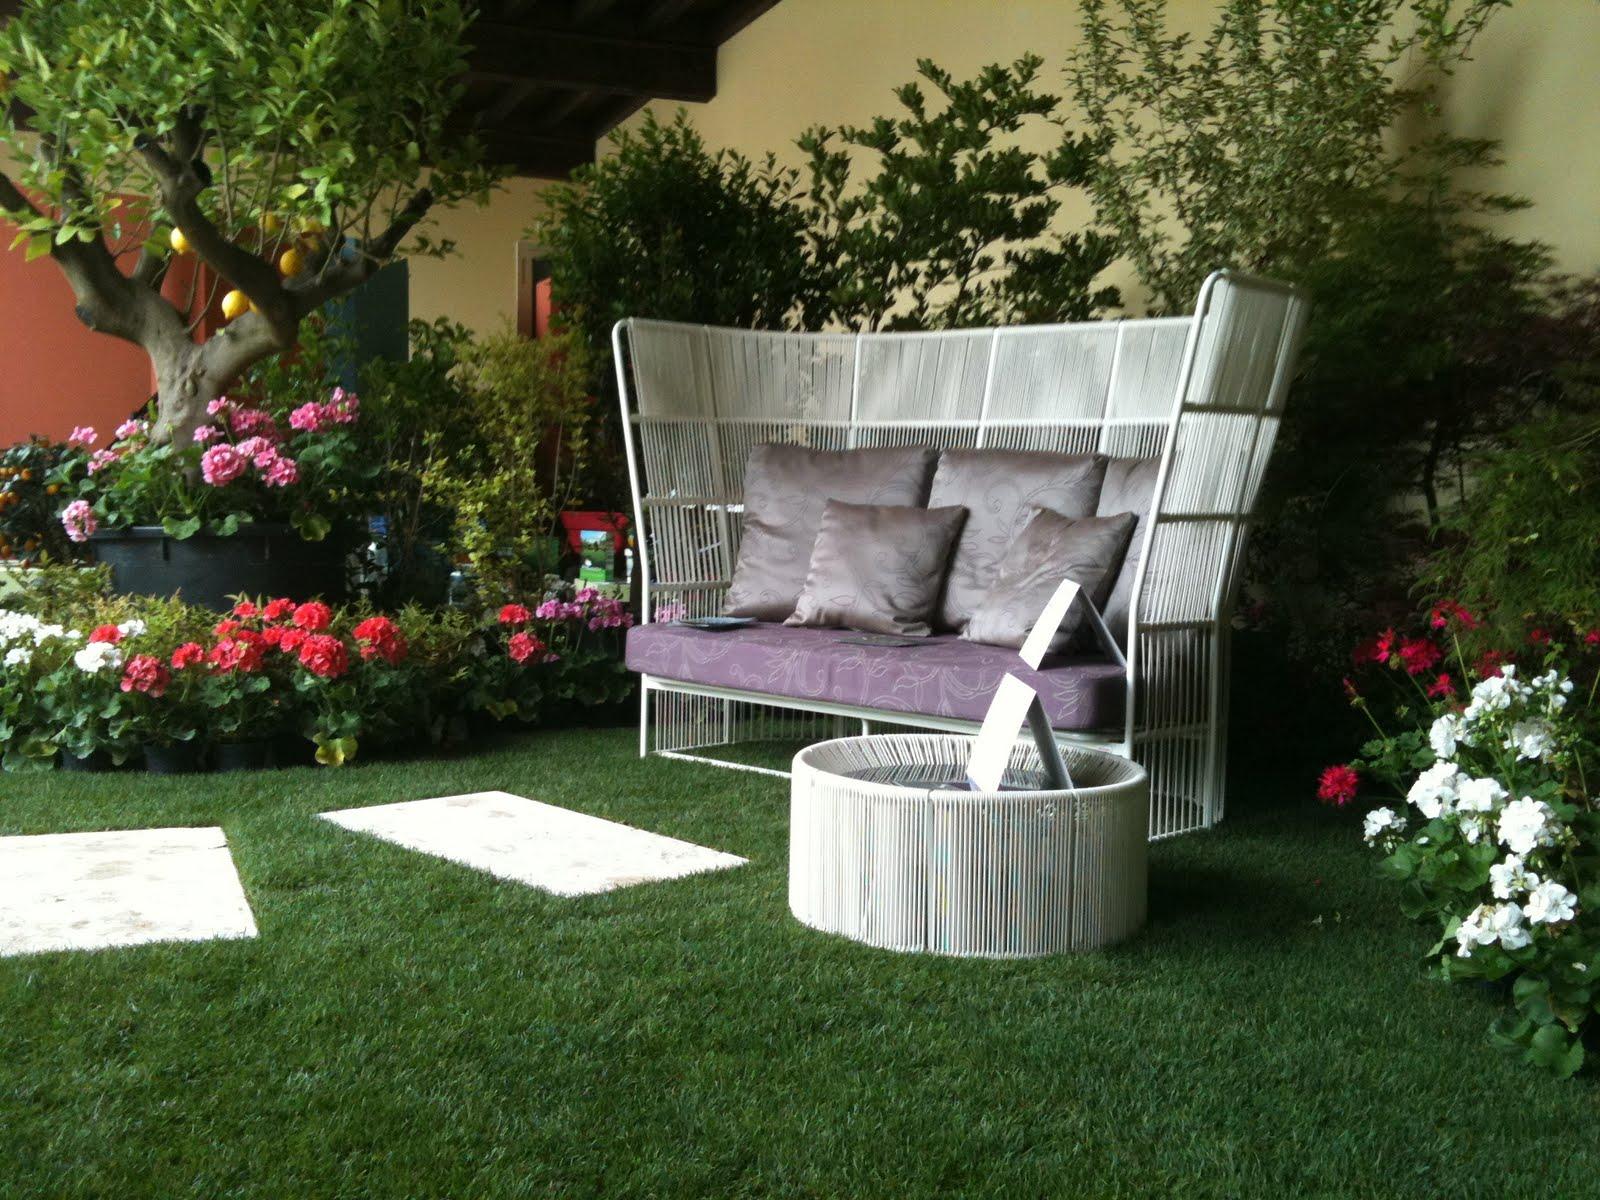 Foto alberelli da giardino